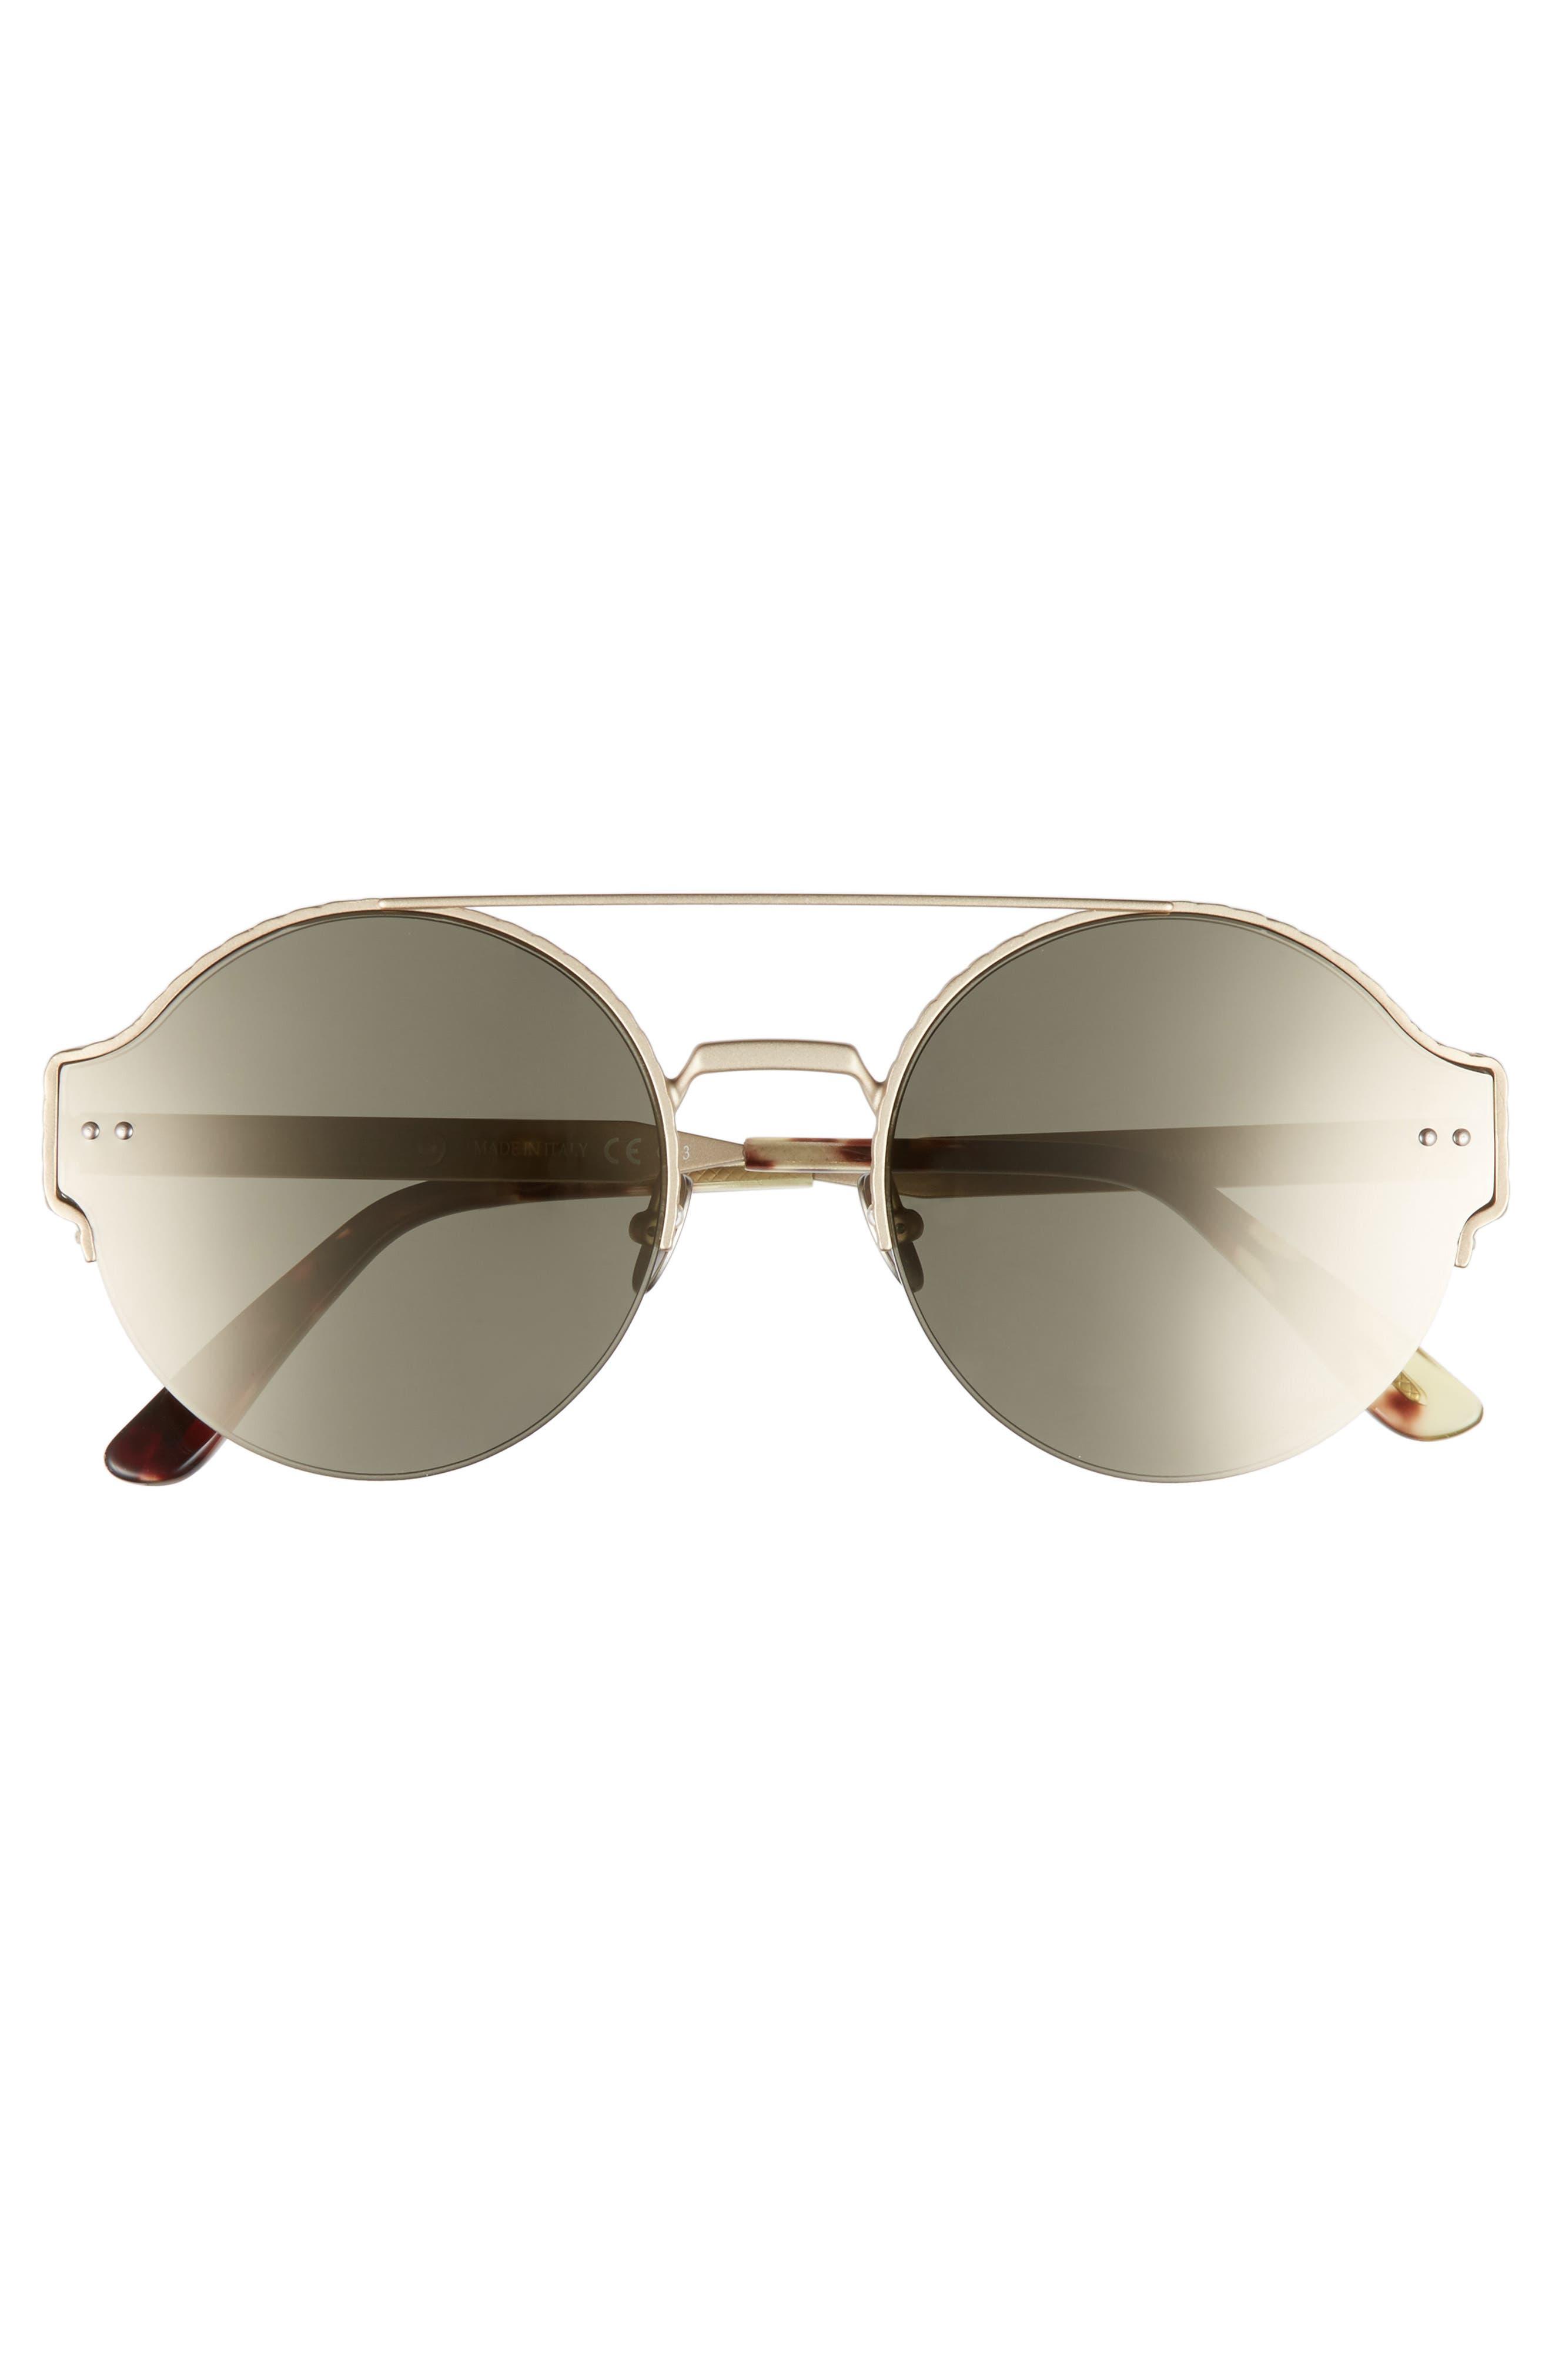 54mm Round Semi-Rimless Sunglasses,                             Alternate thumbnail 8, color,